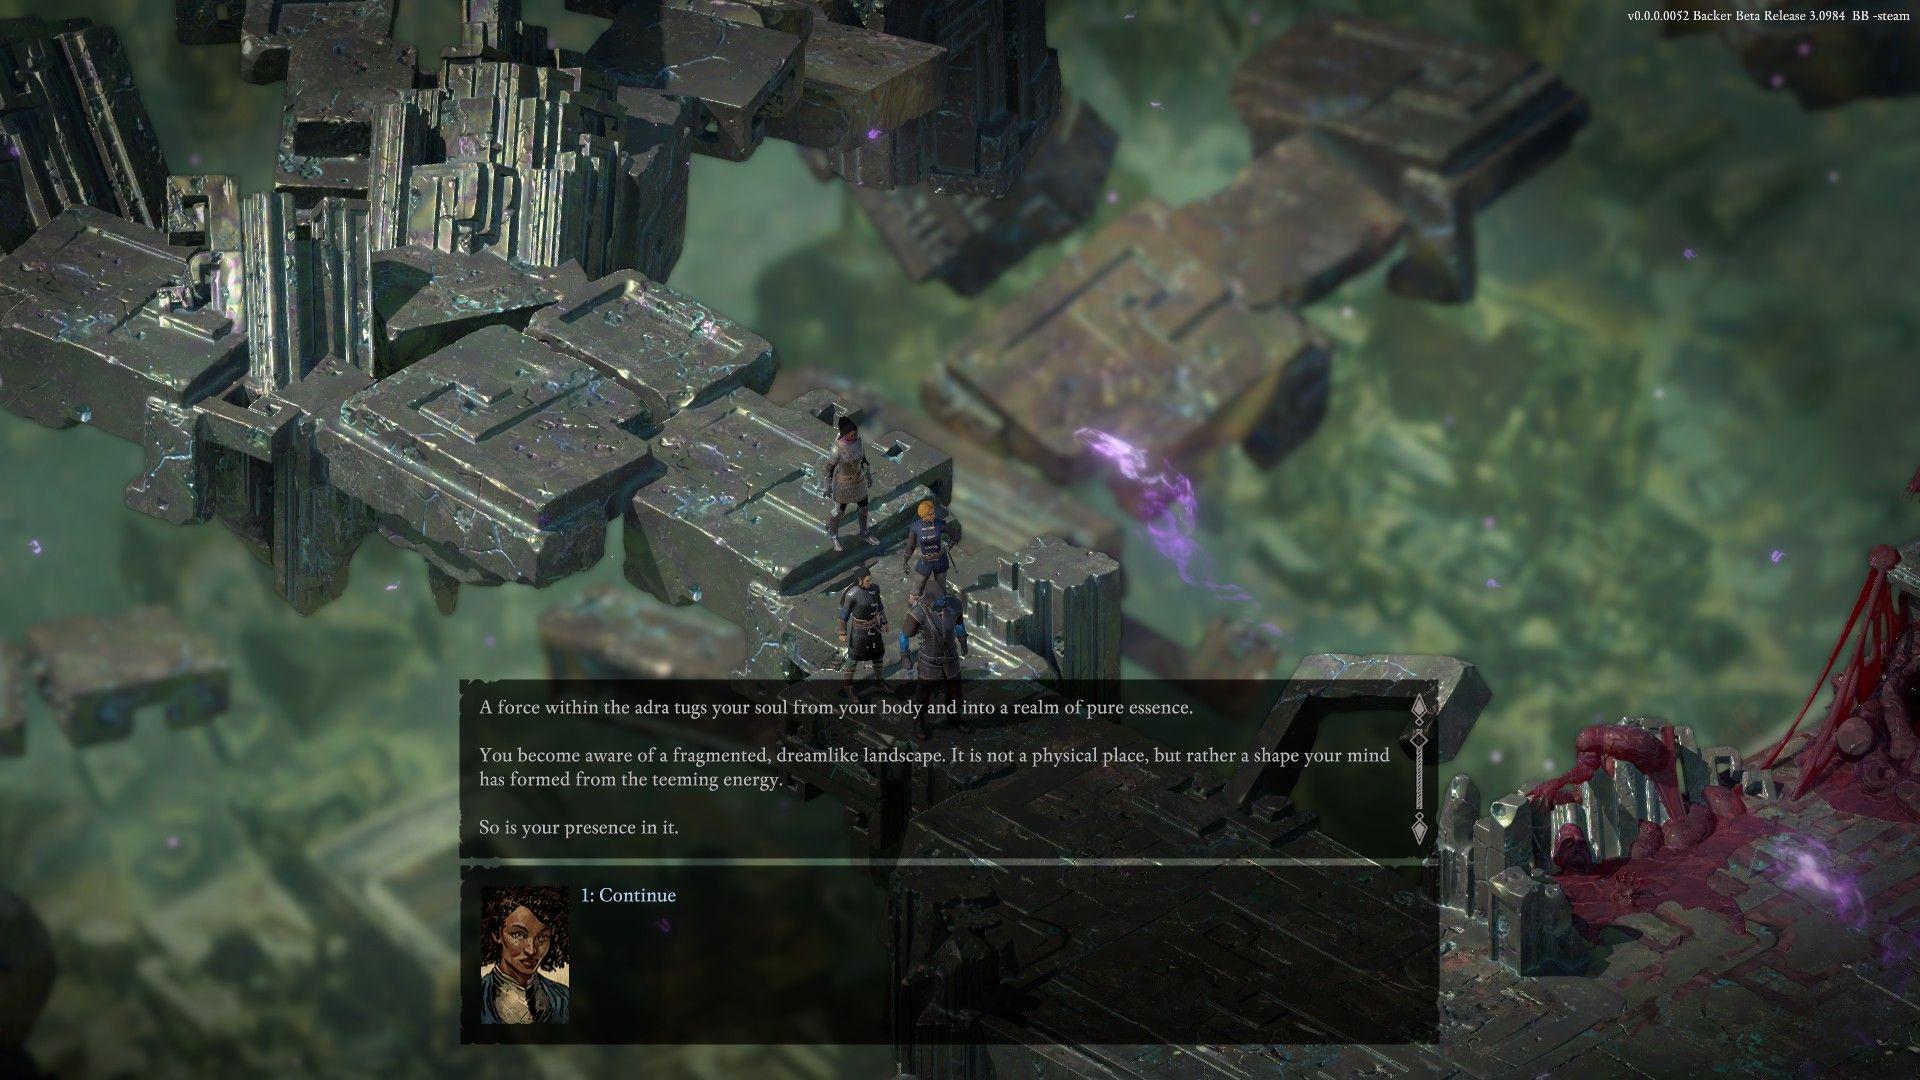 Pillars of Eternity 2: Deadfire Hands-On: Establishing A